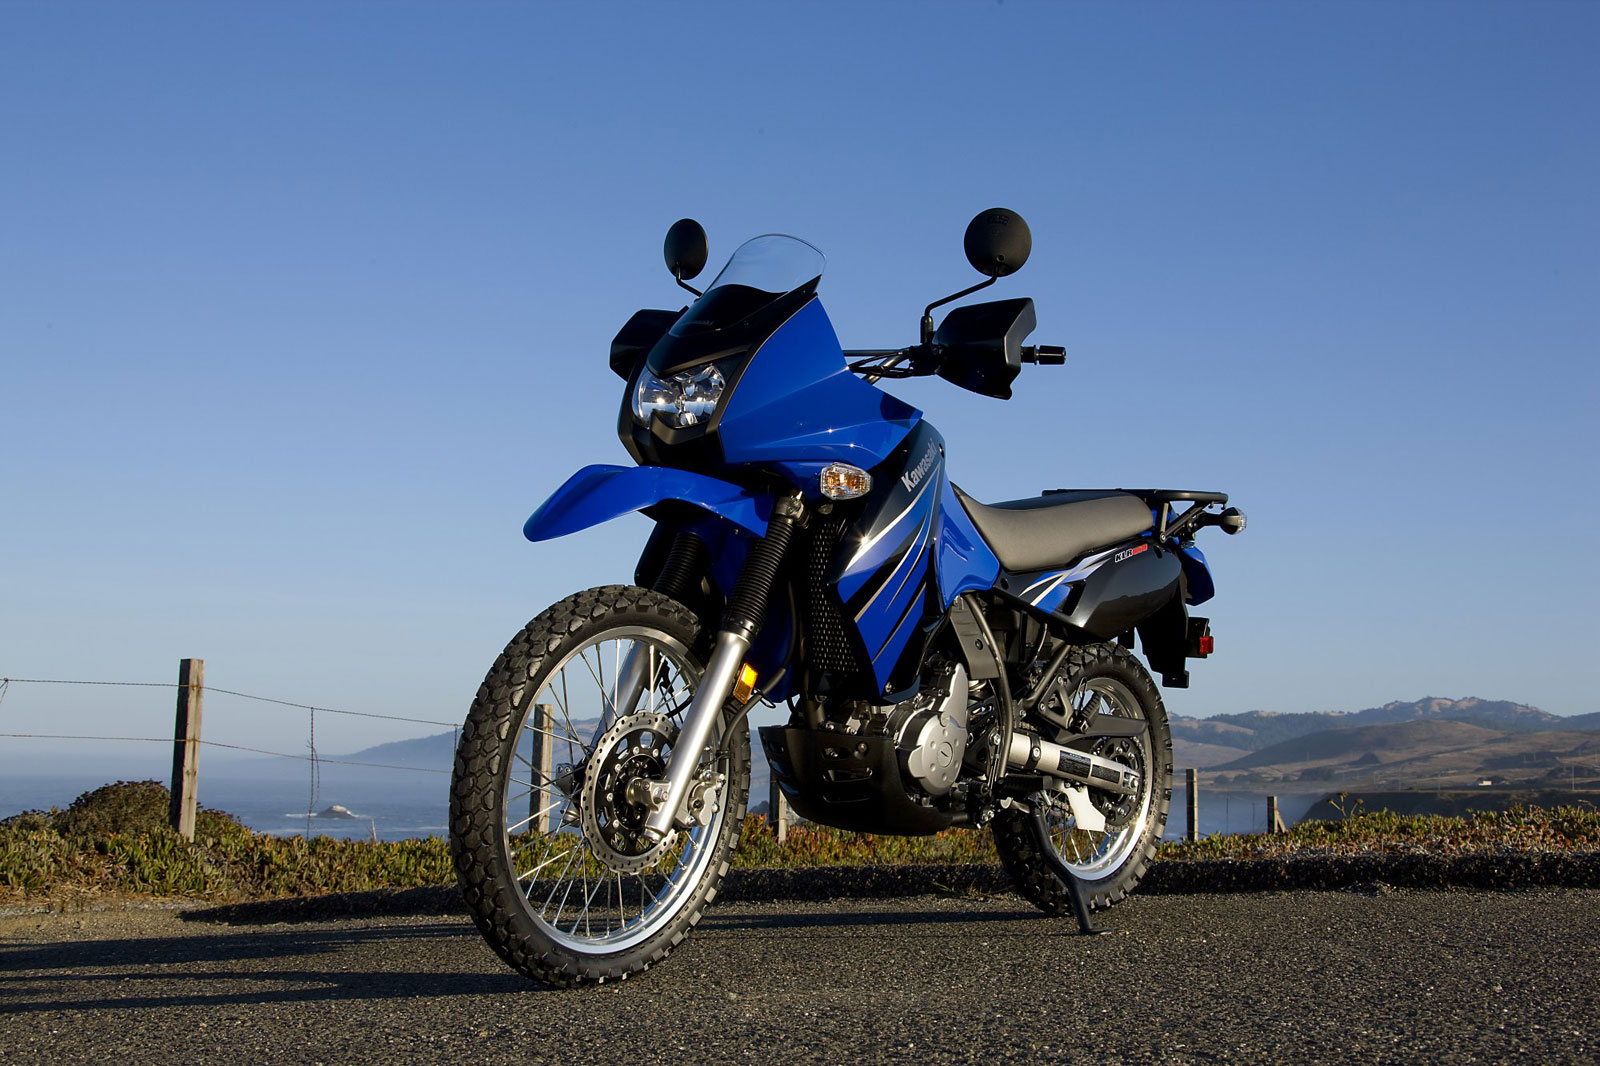 2009 Kawasaki KLR 650 x wallpaper 1600x1066 90385 WallpaperUP 1600x1066